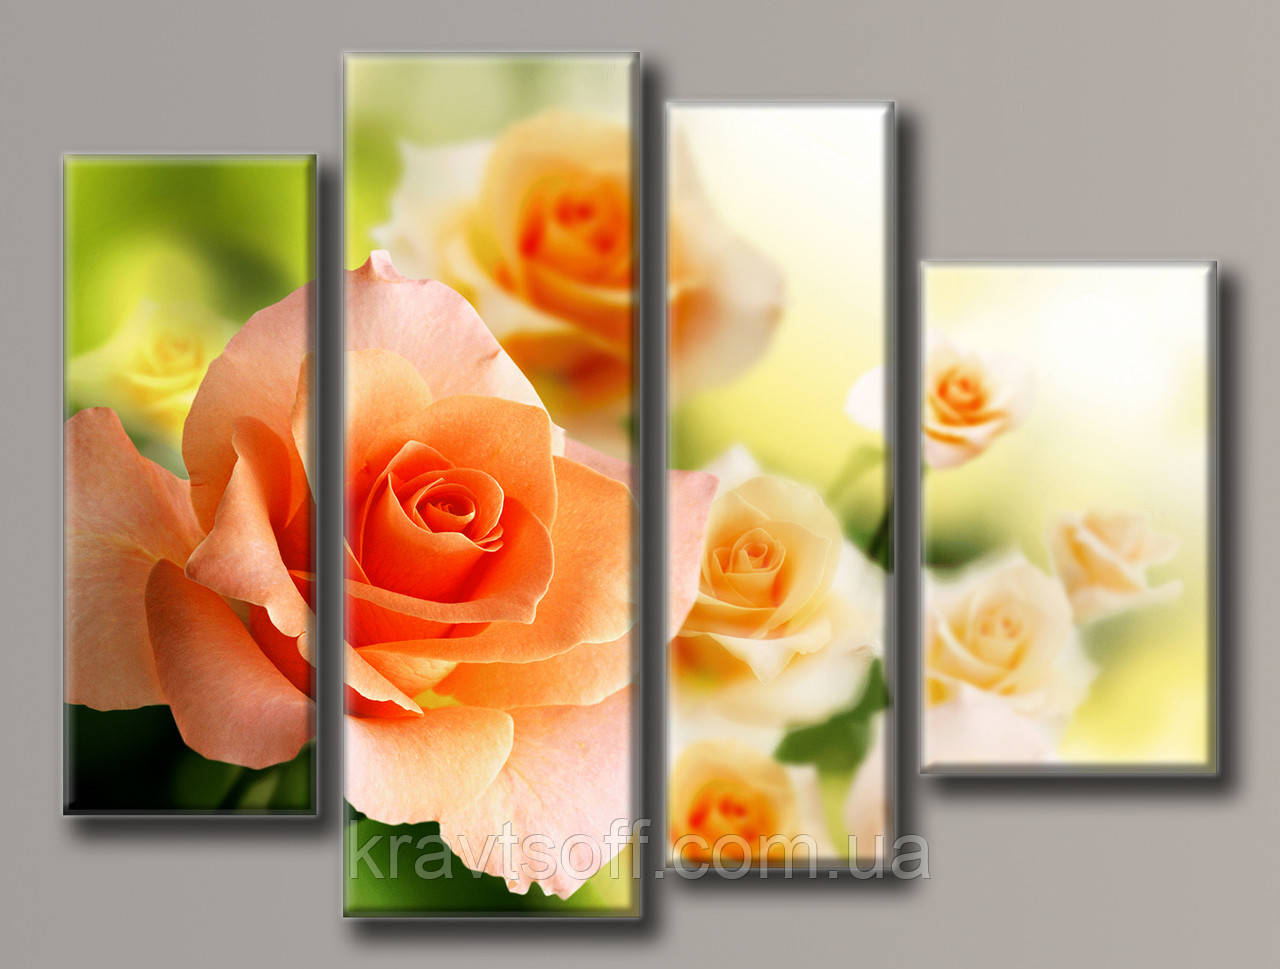 "Модульная картина на холсте из 4-х частей ""Розовые розы"" ( 70х93 см ) арт.HAF-106"